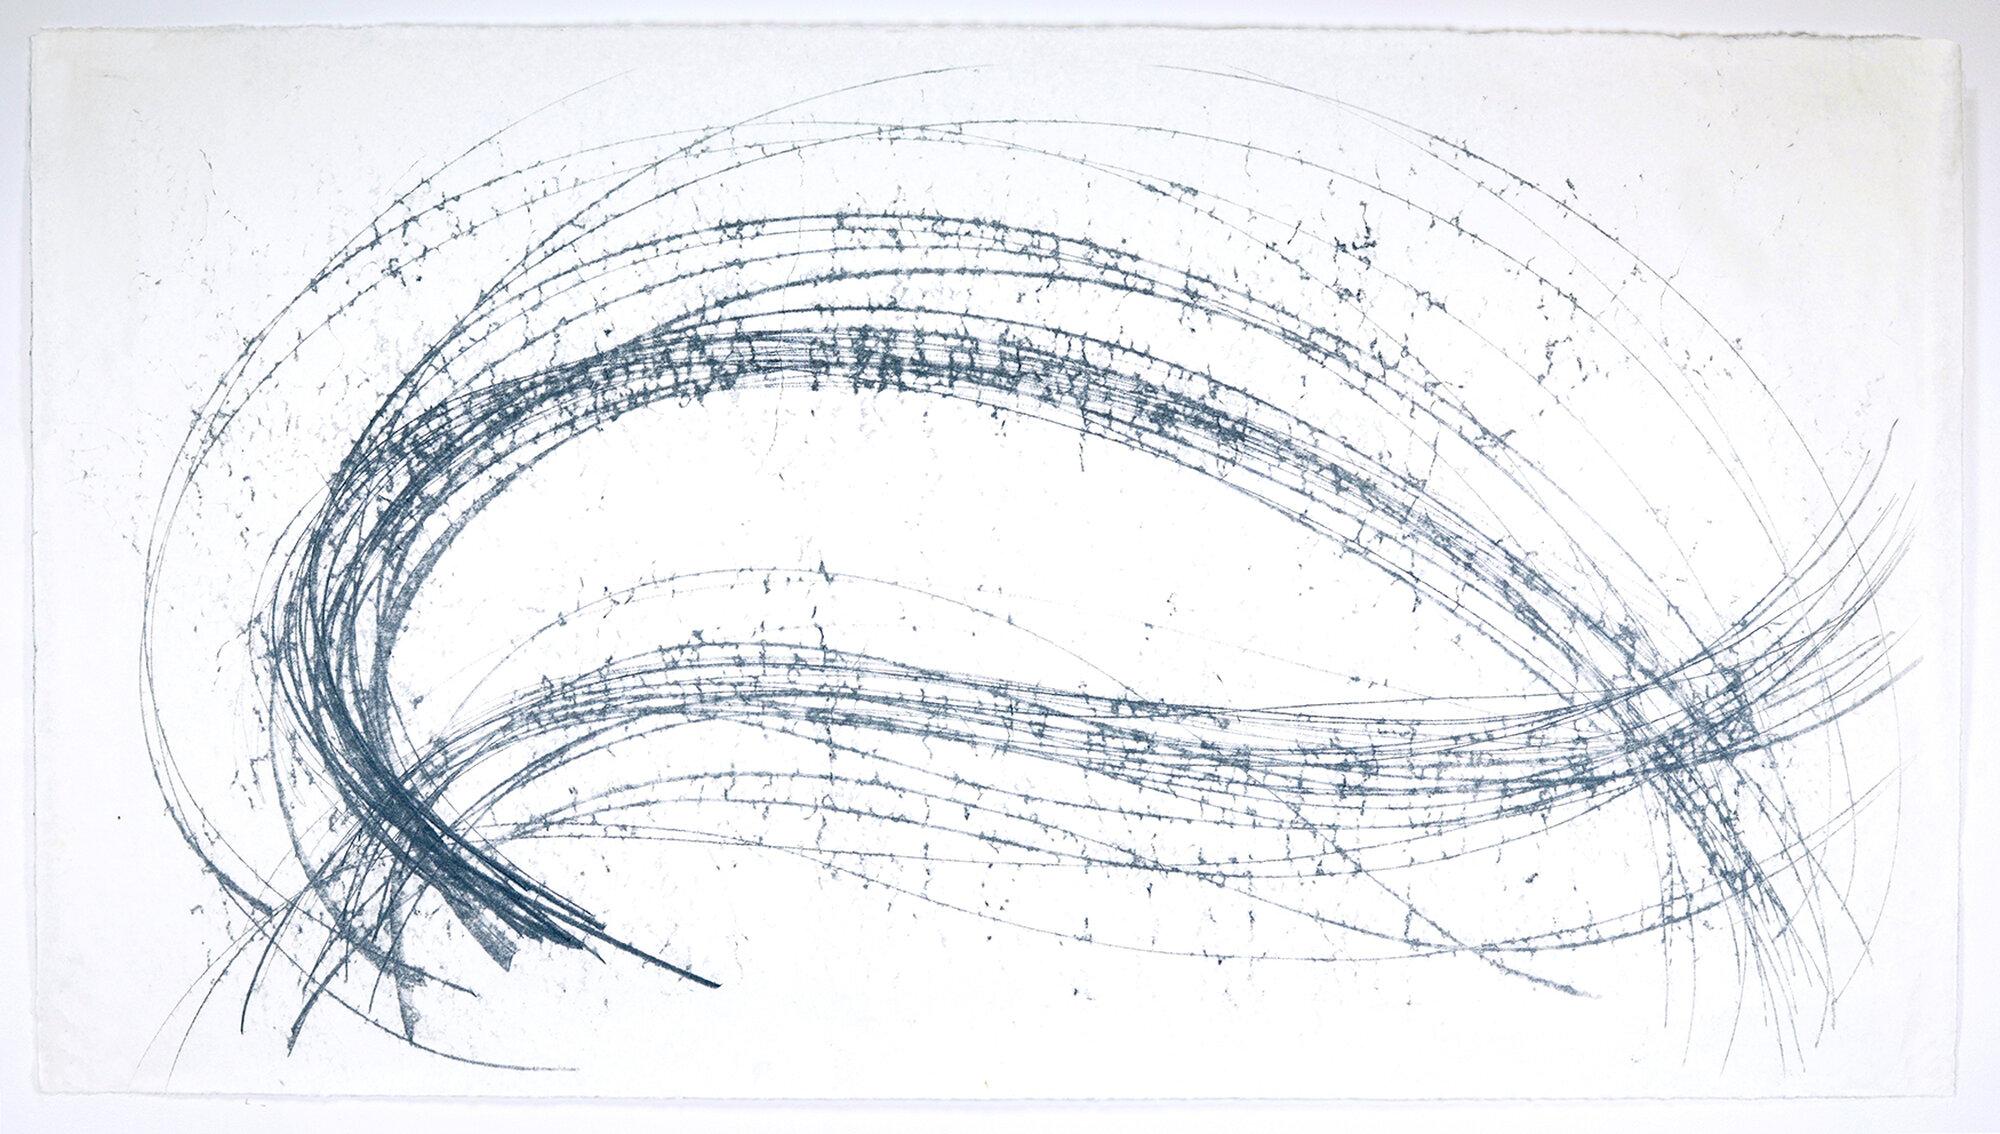 Motion-Tracked Monoprint